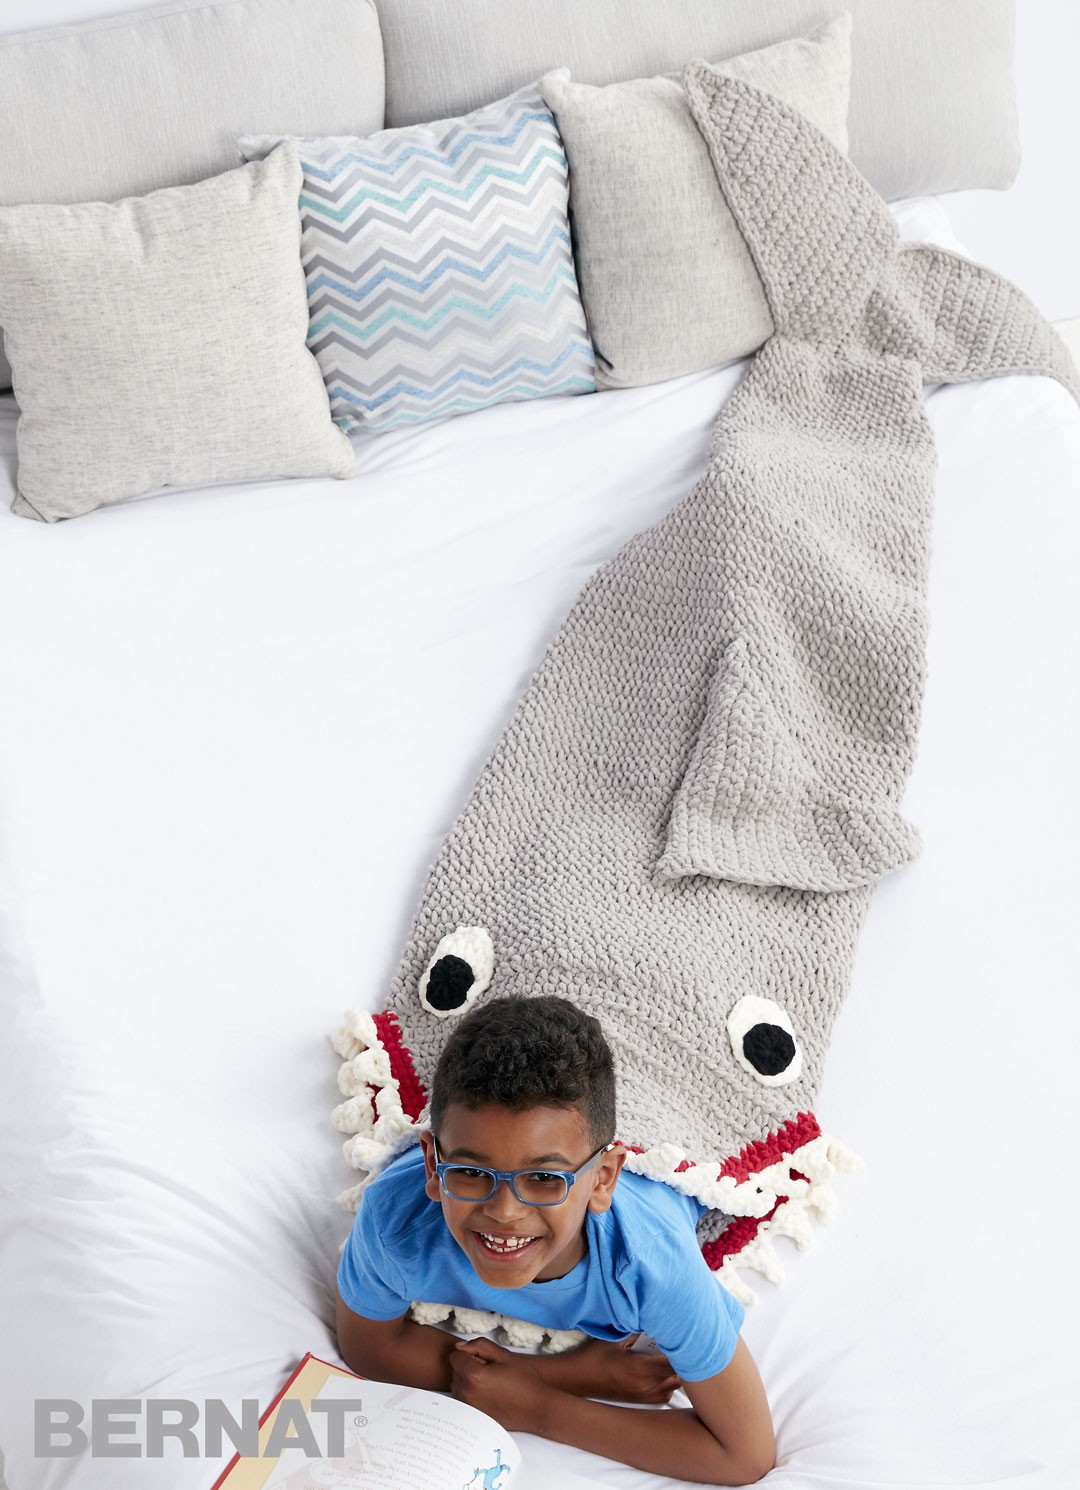 Free Pattern Crochet Shark Blanket : ergahandmade: Crochet Shark Blanket Sack + Free Pattern ...